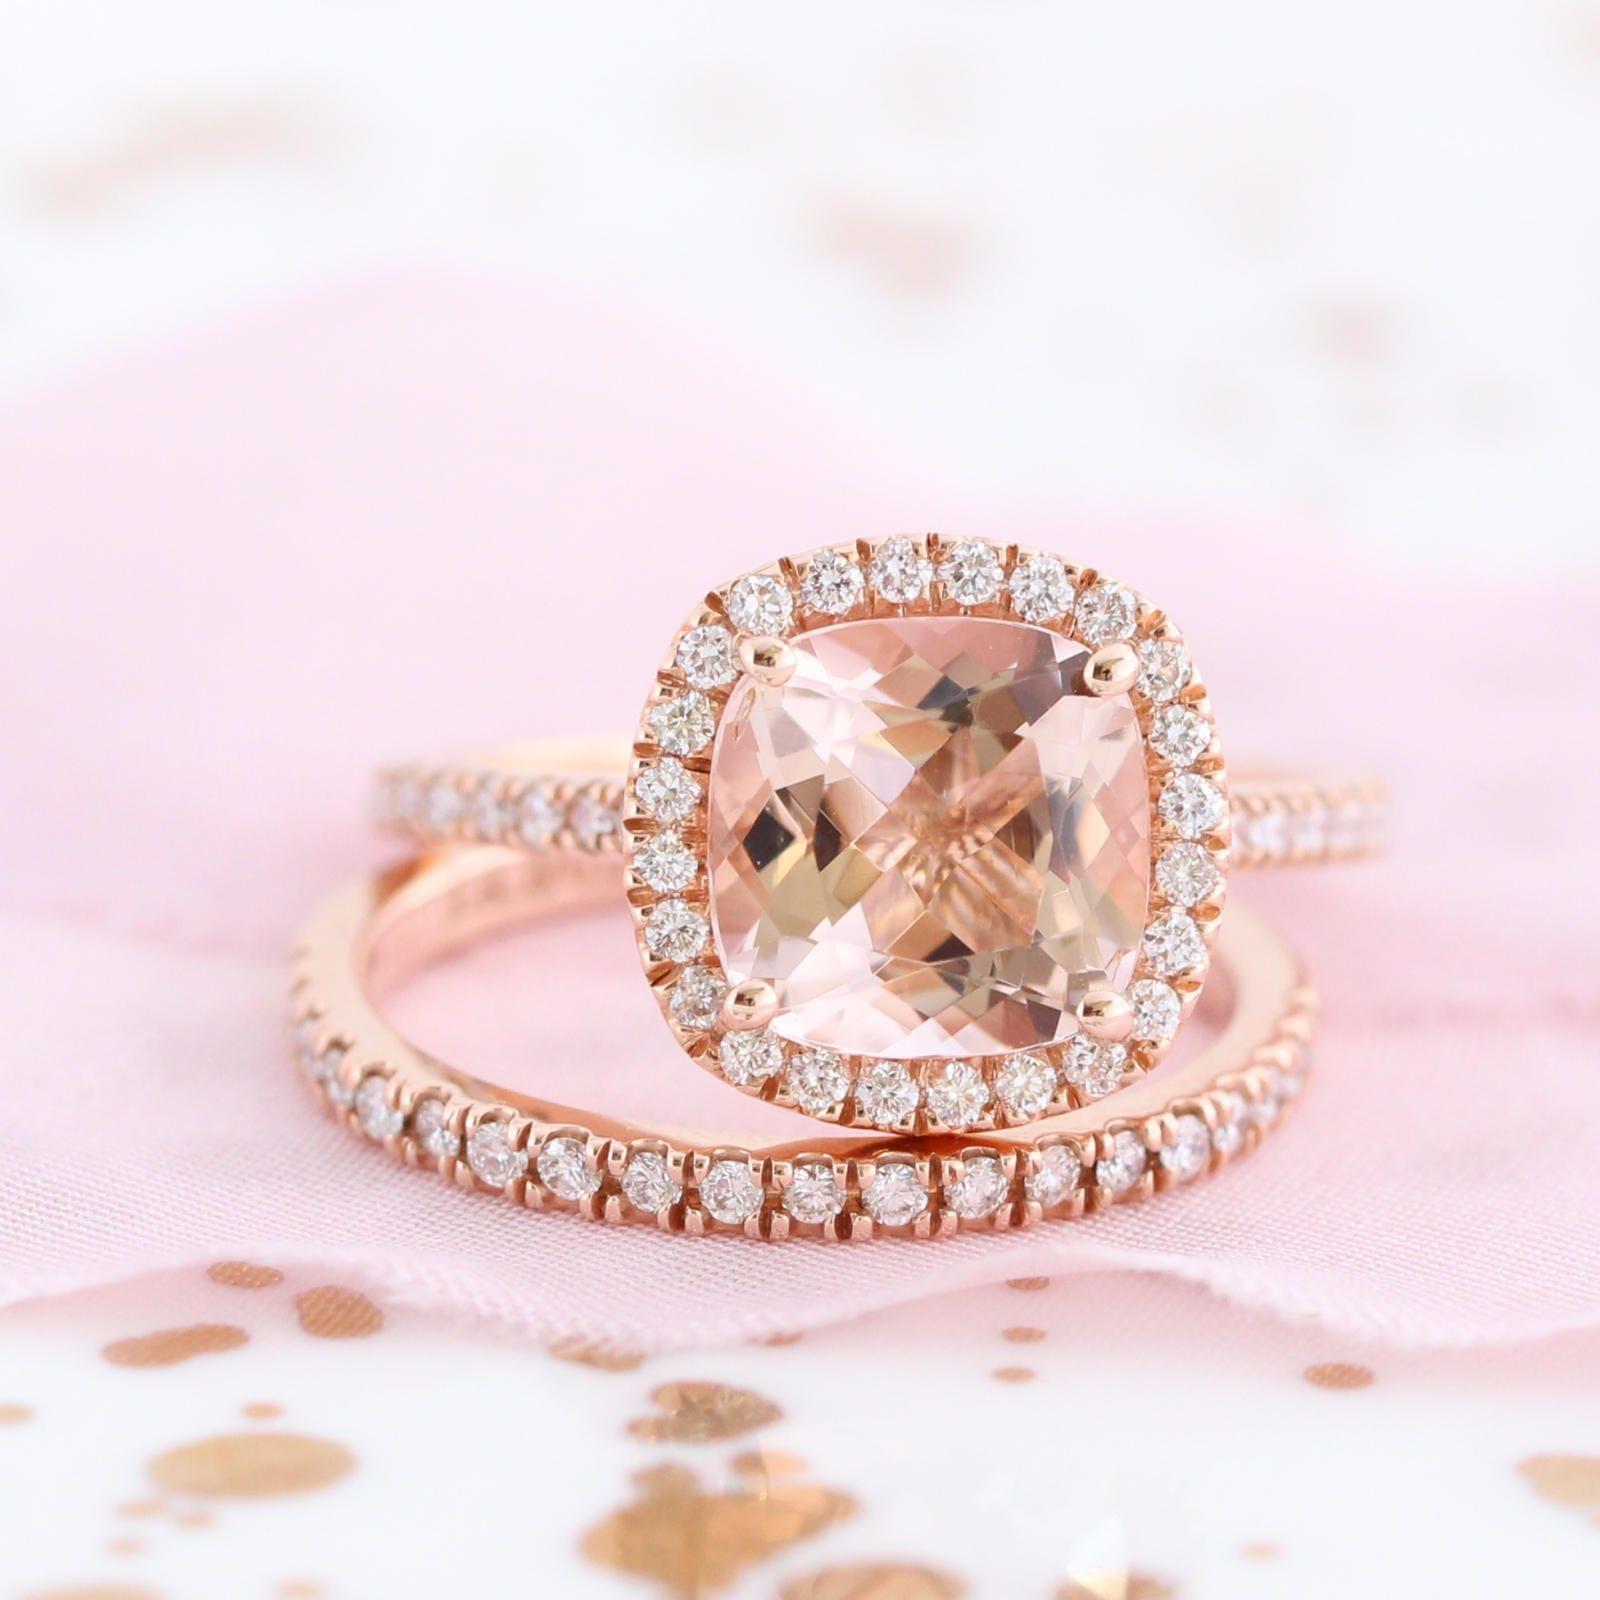 14k Rose Gold Wedding Set Morganite Engagement Ring and Half